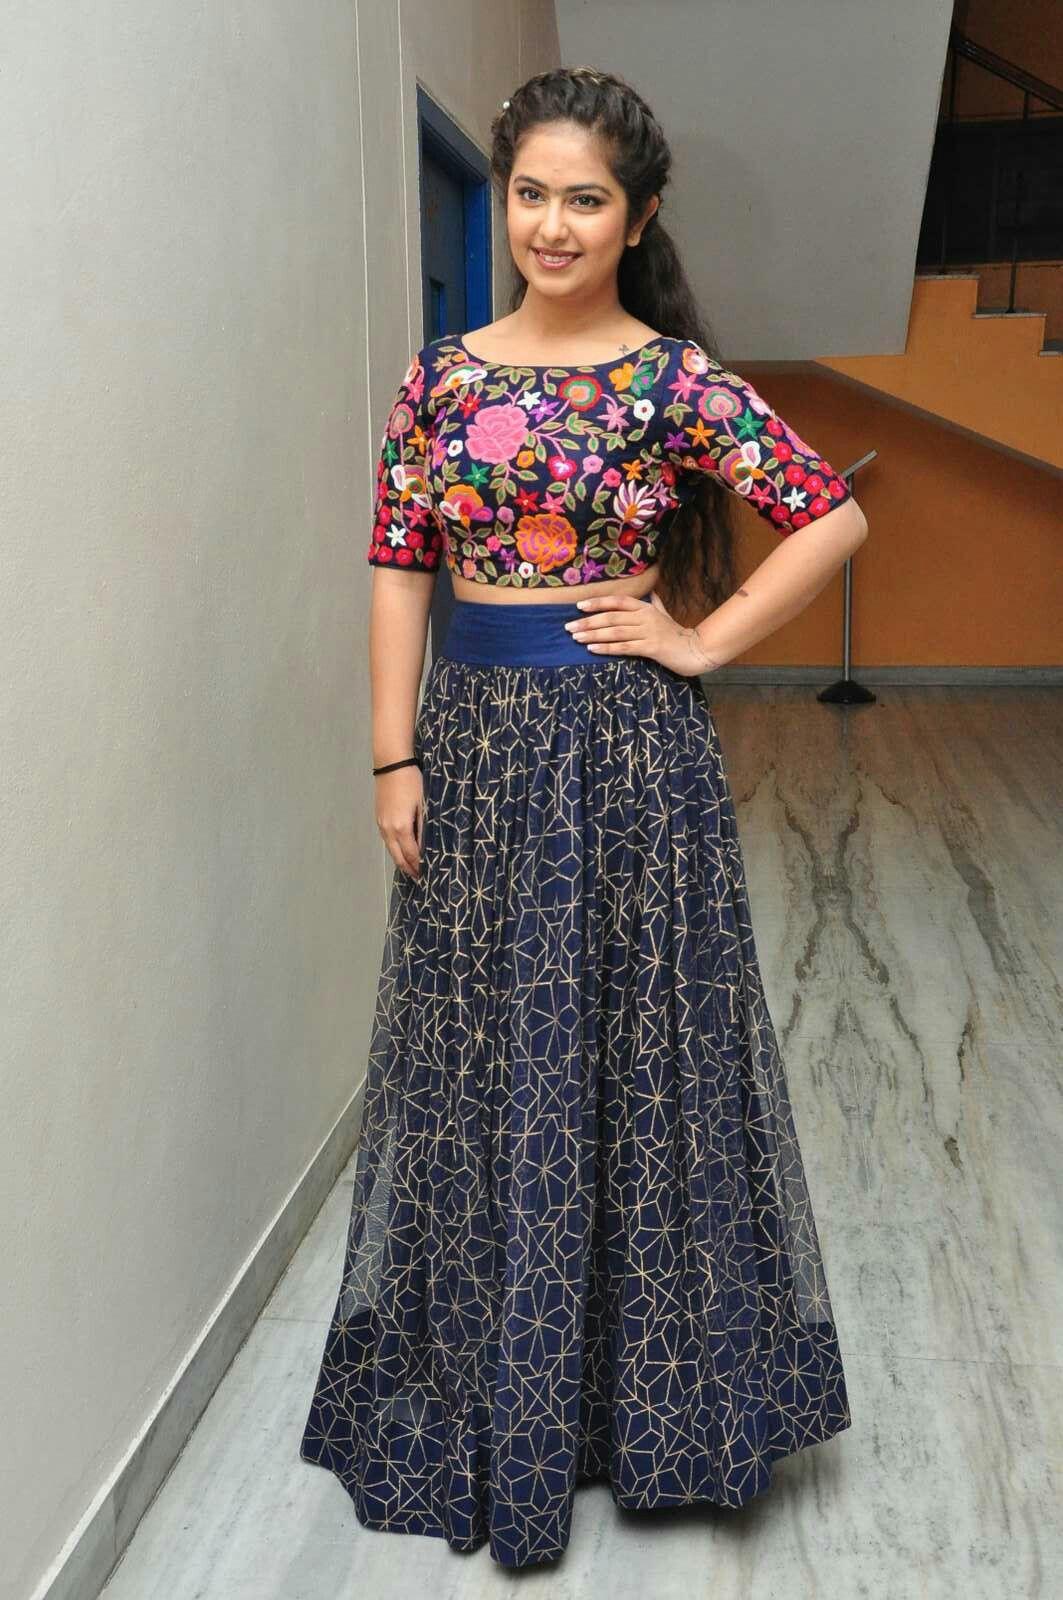 Pin by Anu Mahi on Lehangas   Pinterest   Indian skirt Designer wear and Dress designs